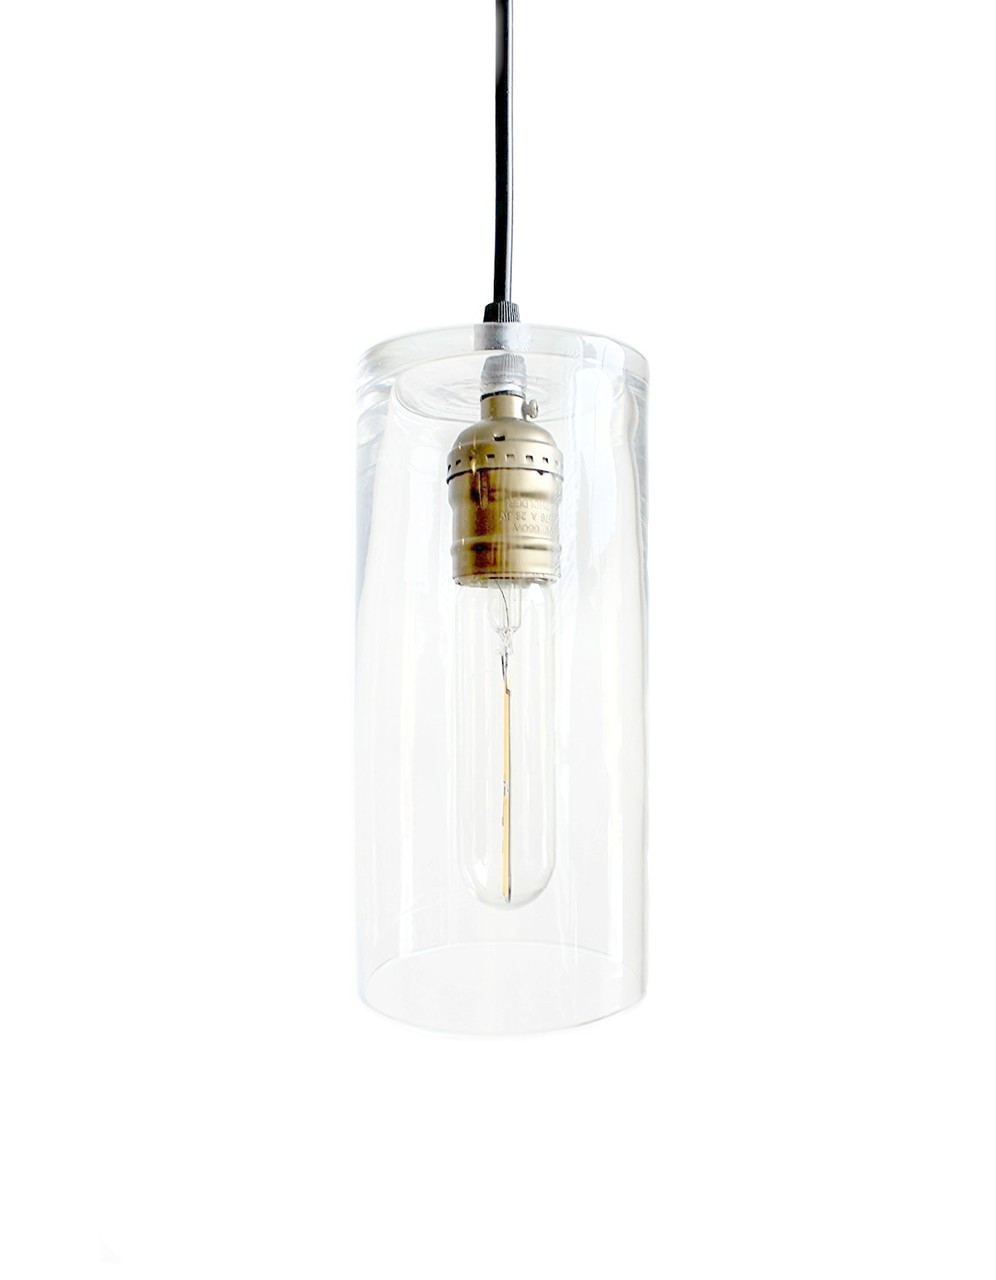 Glass Pendant Industrial Lighting - Farmhouse Kitchen Island Bar Drop Light  hanging, Hurricane Pendent Lighting - Glass Pendant Industrial Lighting - Farmhouse Kitchen Island Bar